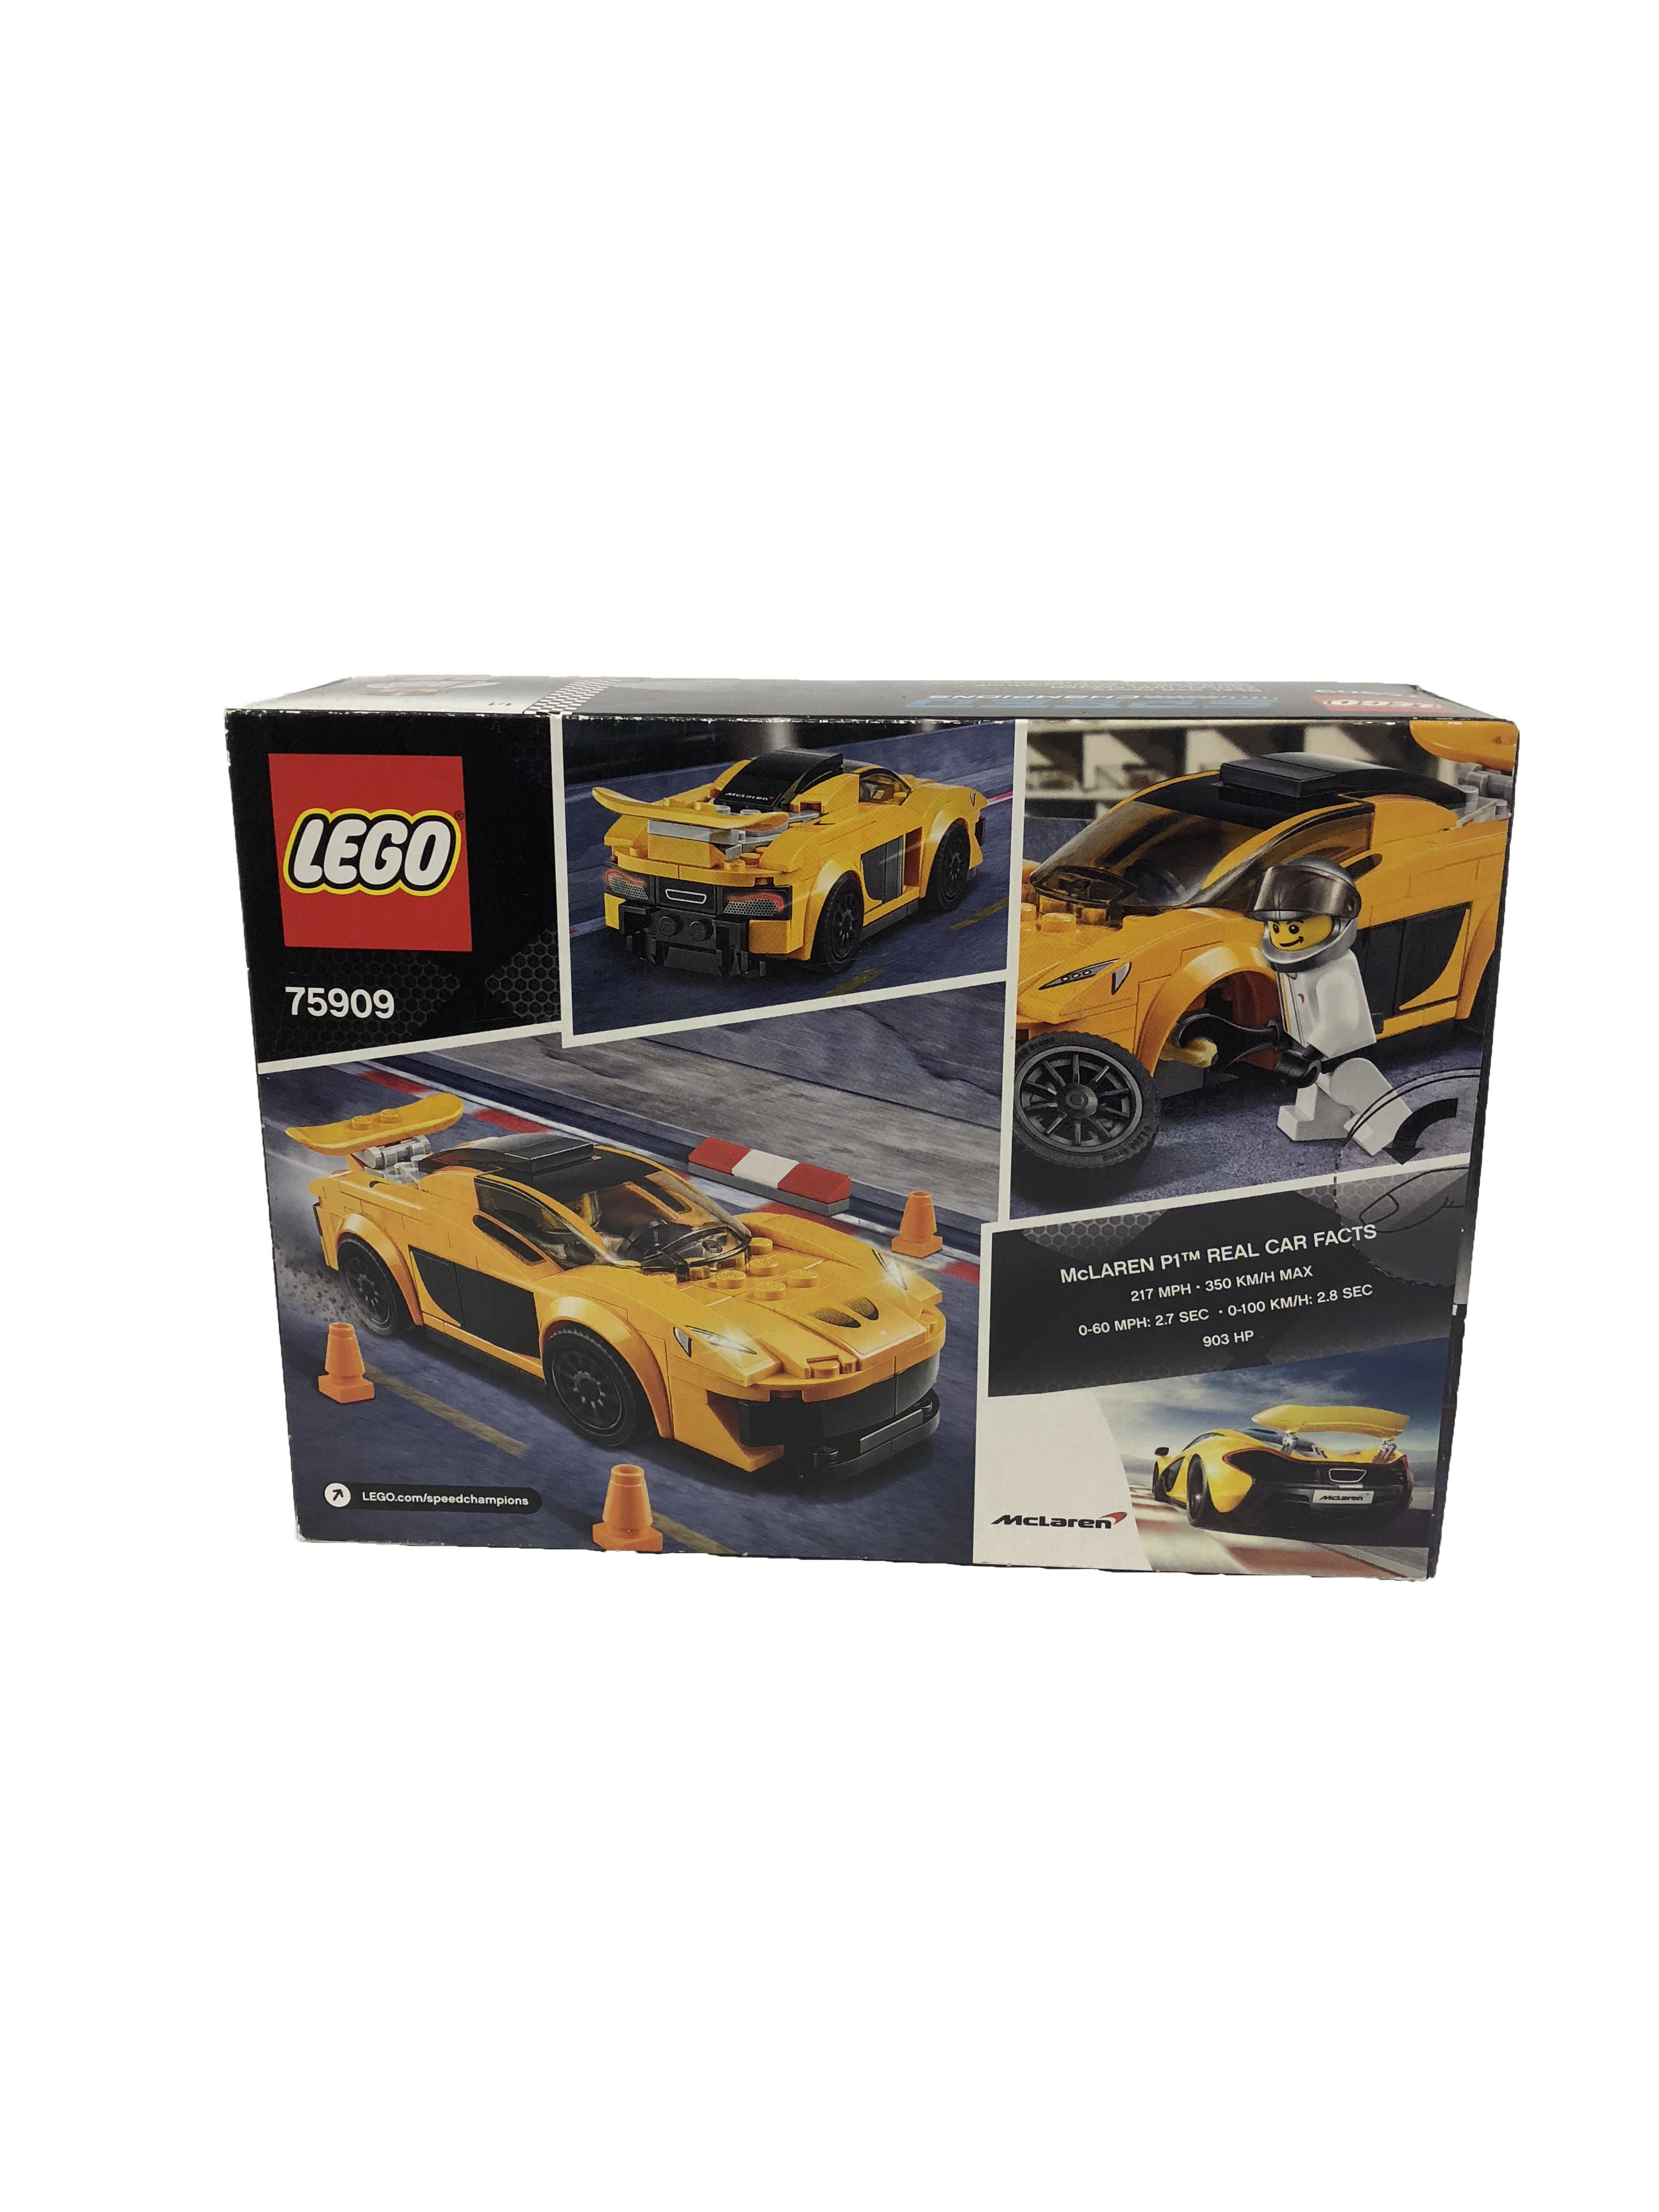 McLaren Official Lego P1 Set